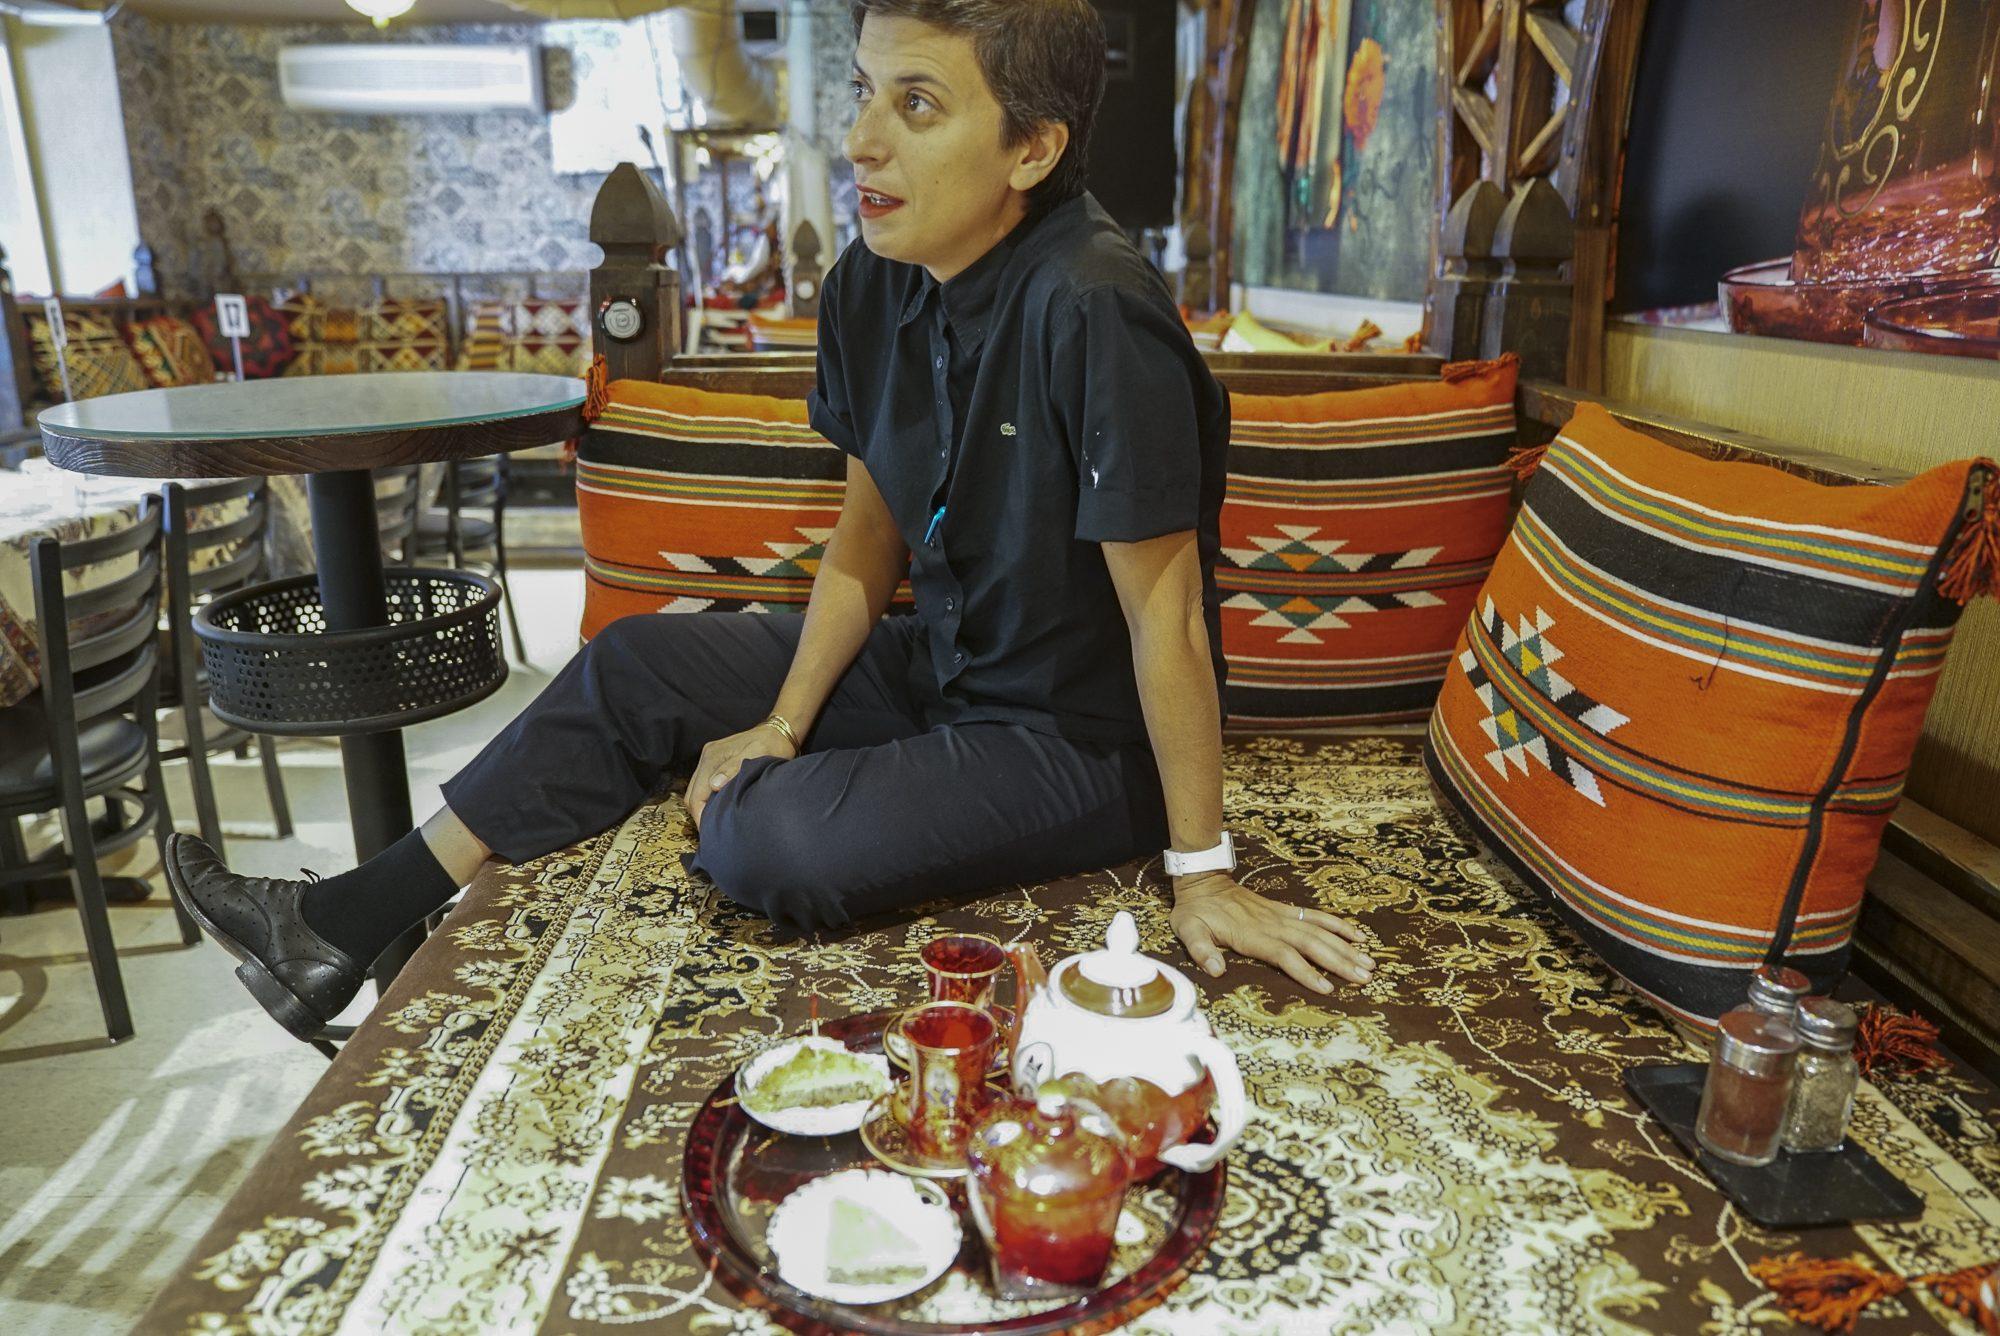 toronto-restaurants-chefs-in-the-burbs-samira-mohyeddin-banu-north-york-shabestan-sitting-with-tea